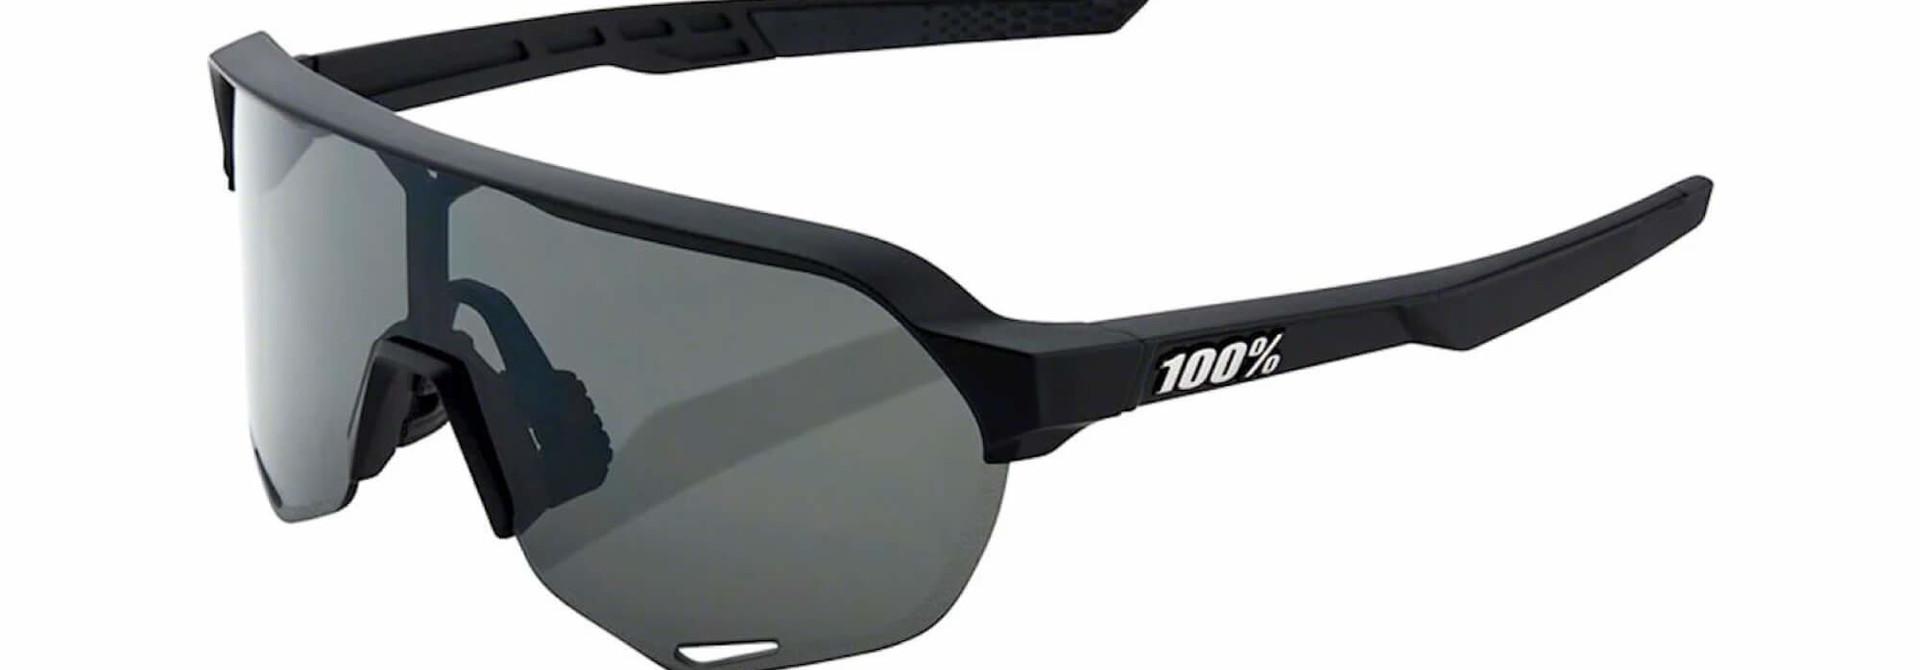 S2 Soft Tact Black Smoke Lens